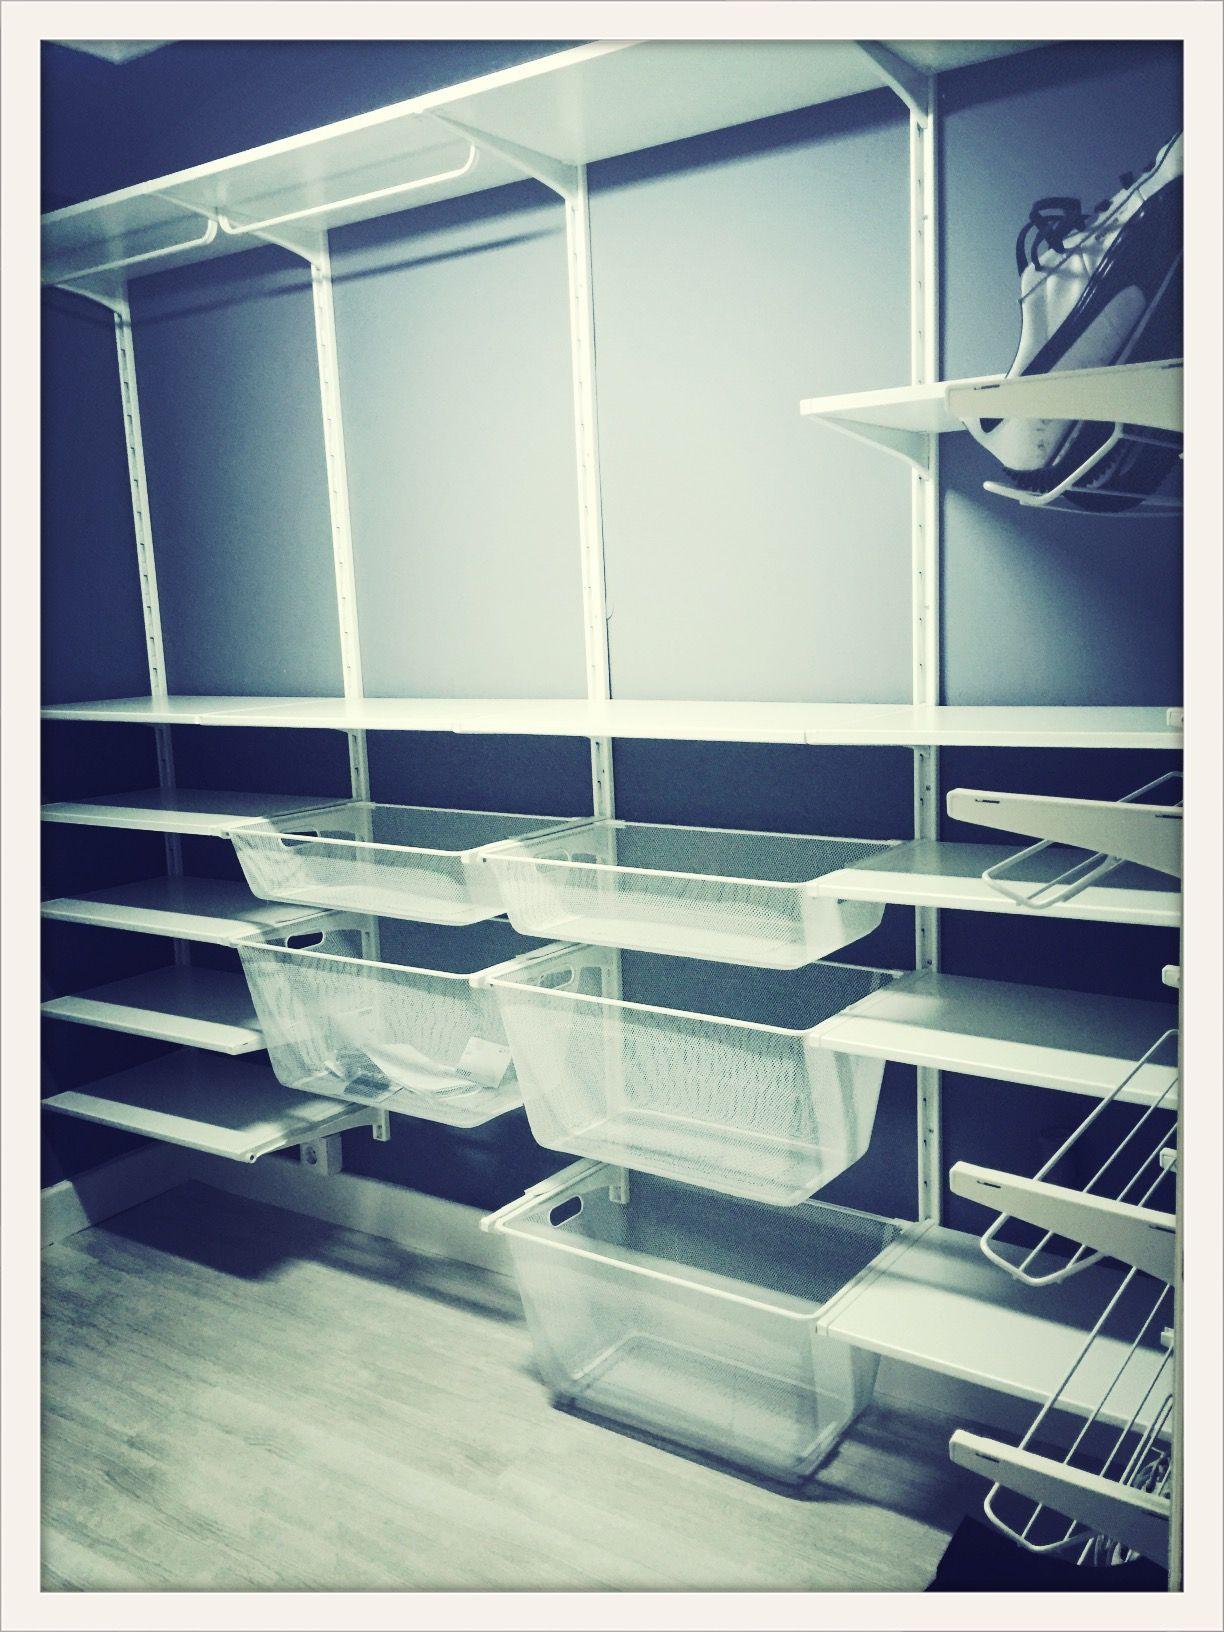 Cabina Armadio Algot Ikea.Vestidor Algot Ikea Kitchen And Forniture Cabina Armadio